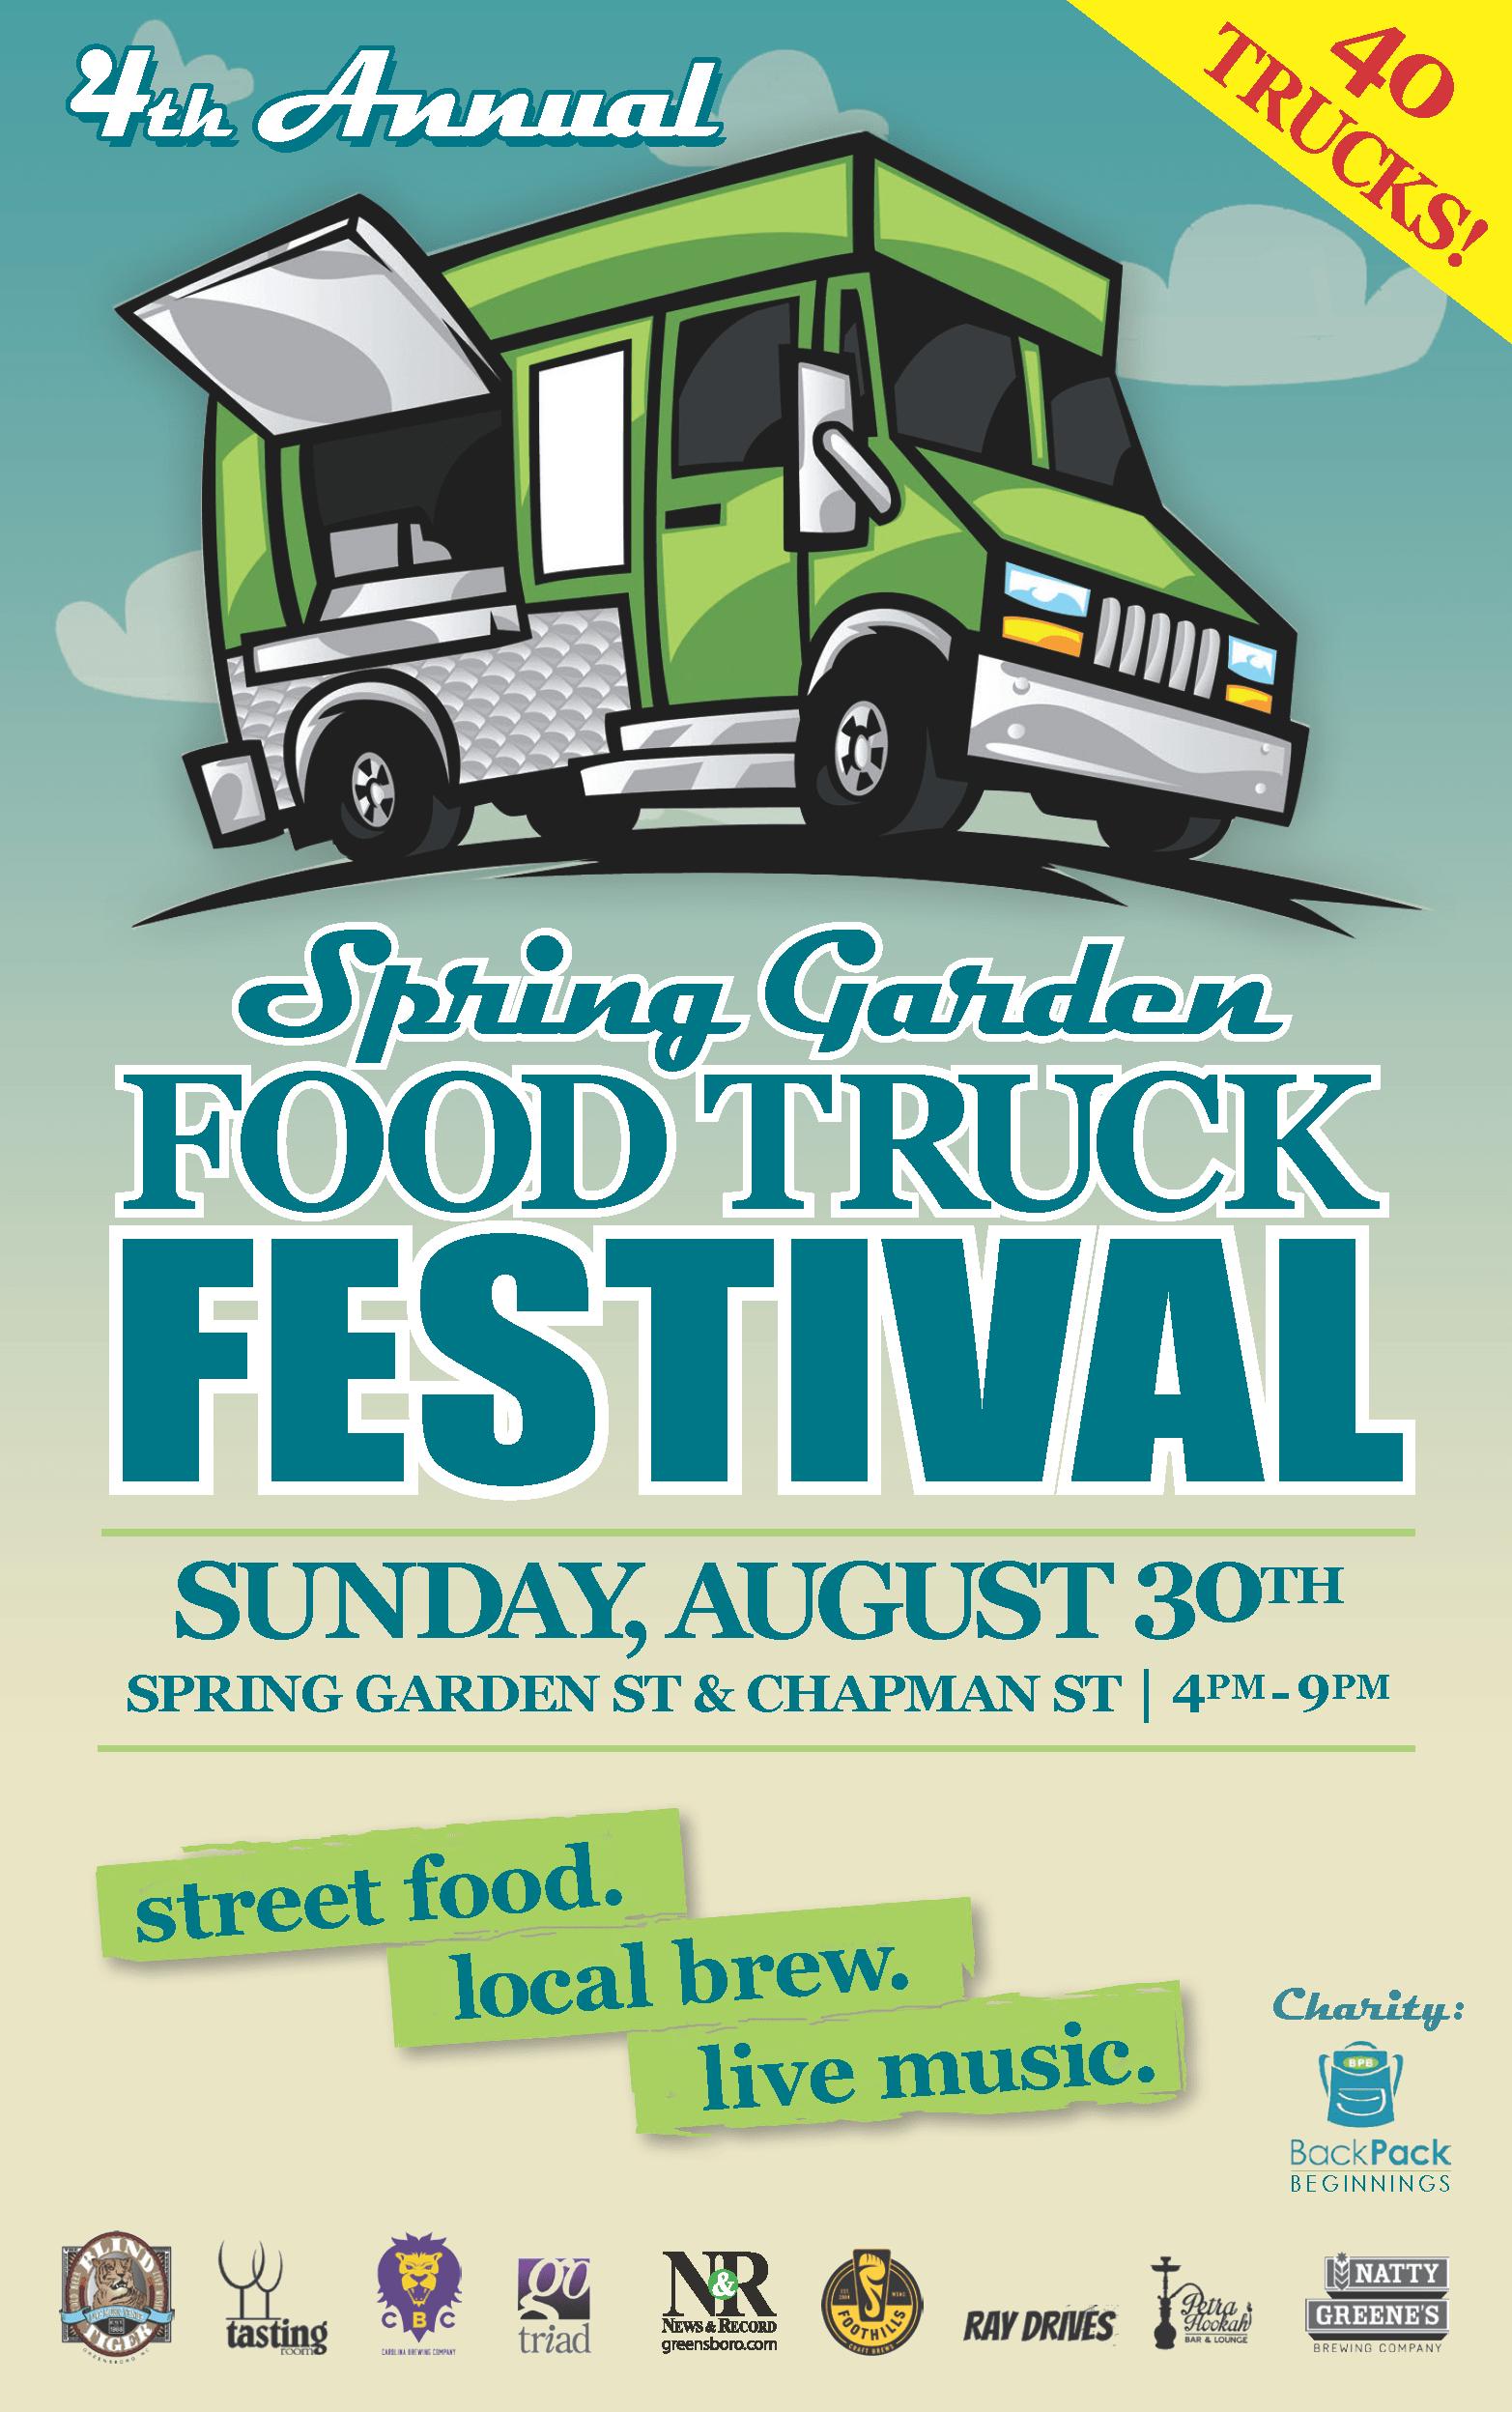 food truck festival rebuilt3 (1) (1)